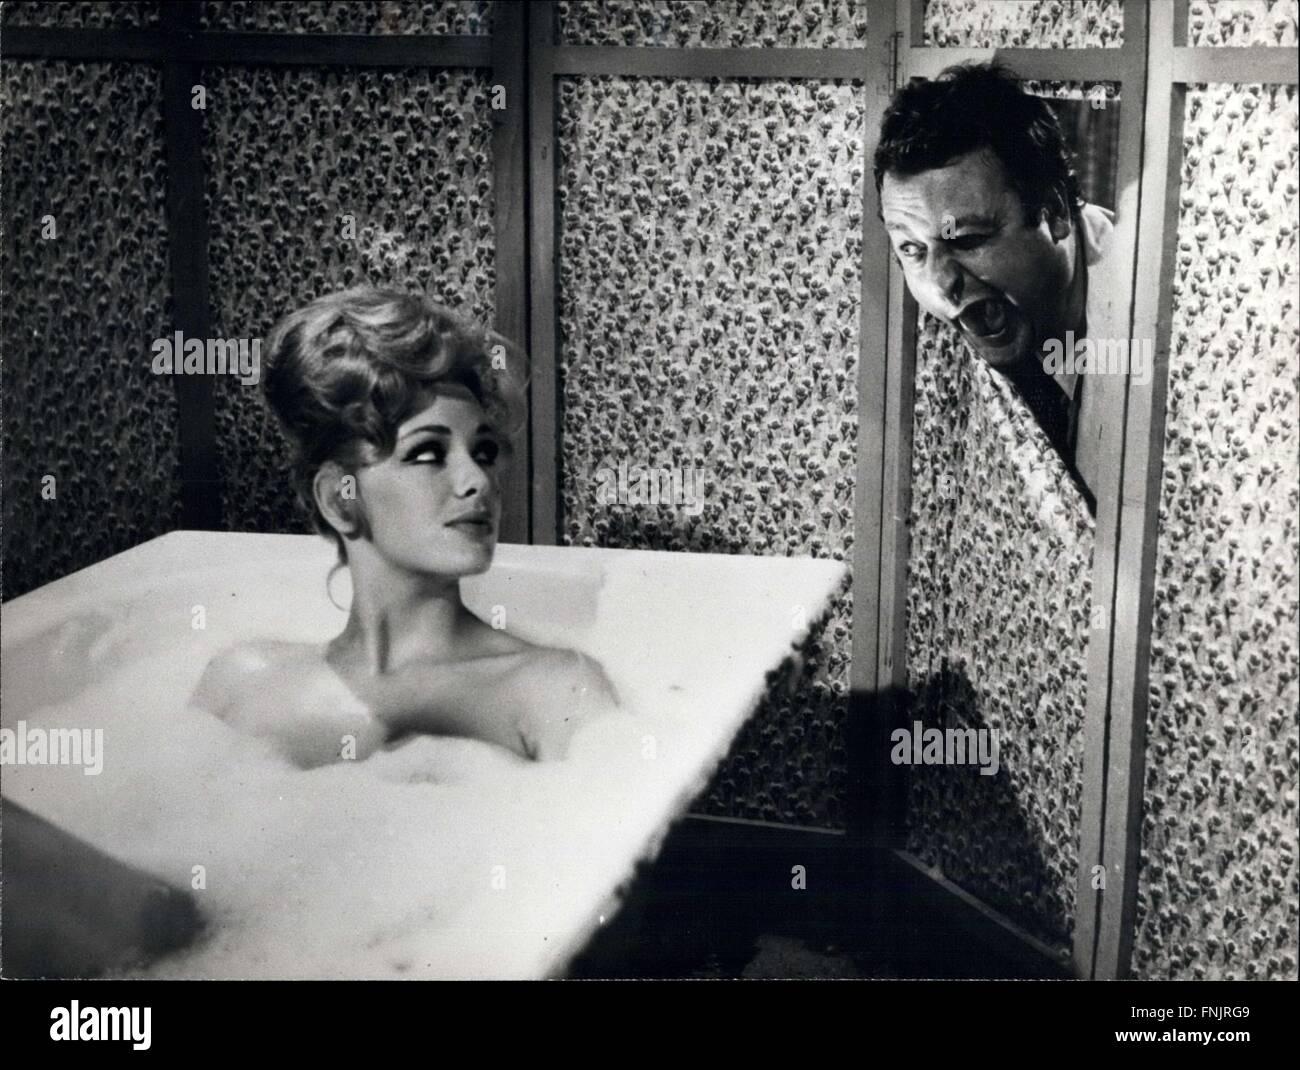 Letty Alonzo (b. 1932),Grandassa Models Porn clip Natalie Morales (actress),Cynthia Nixon